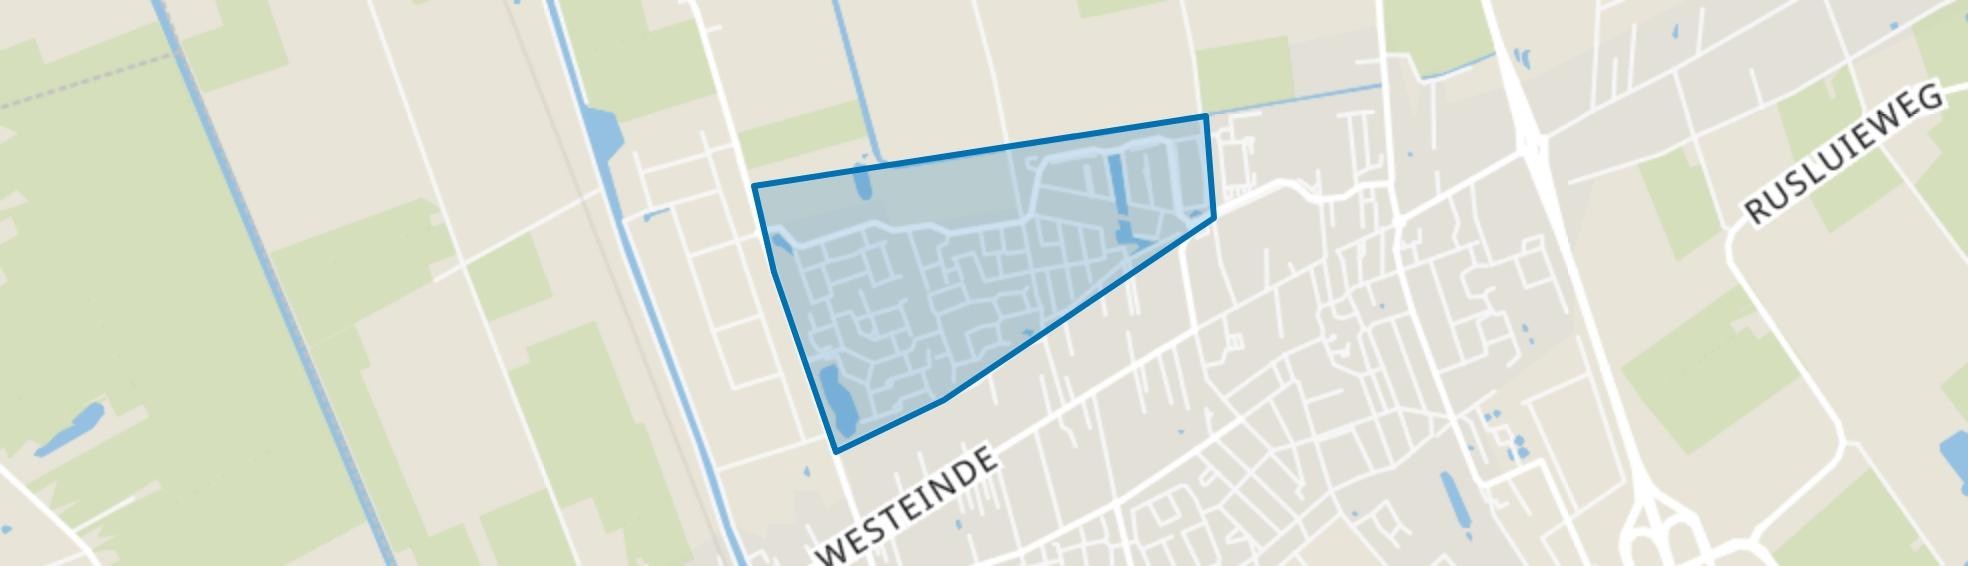 Toekomstig bestemmingsplan Noord, Vriezenveen map